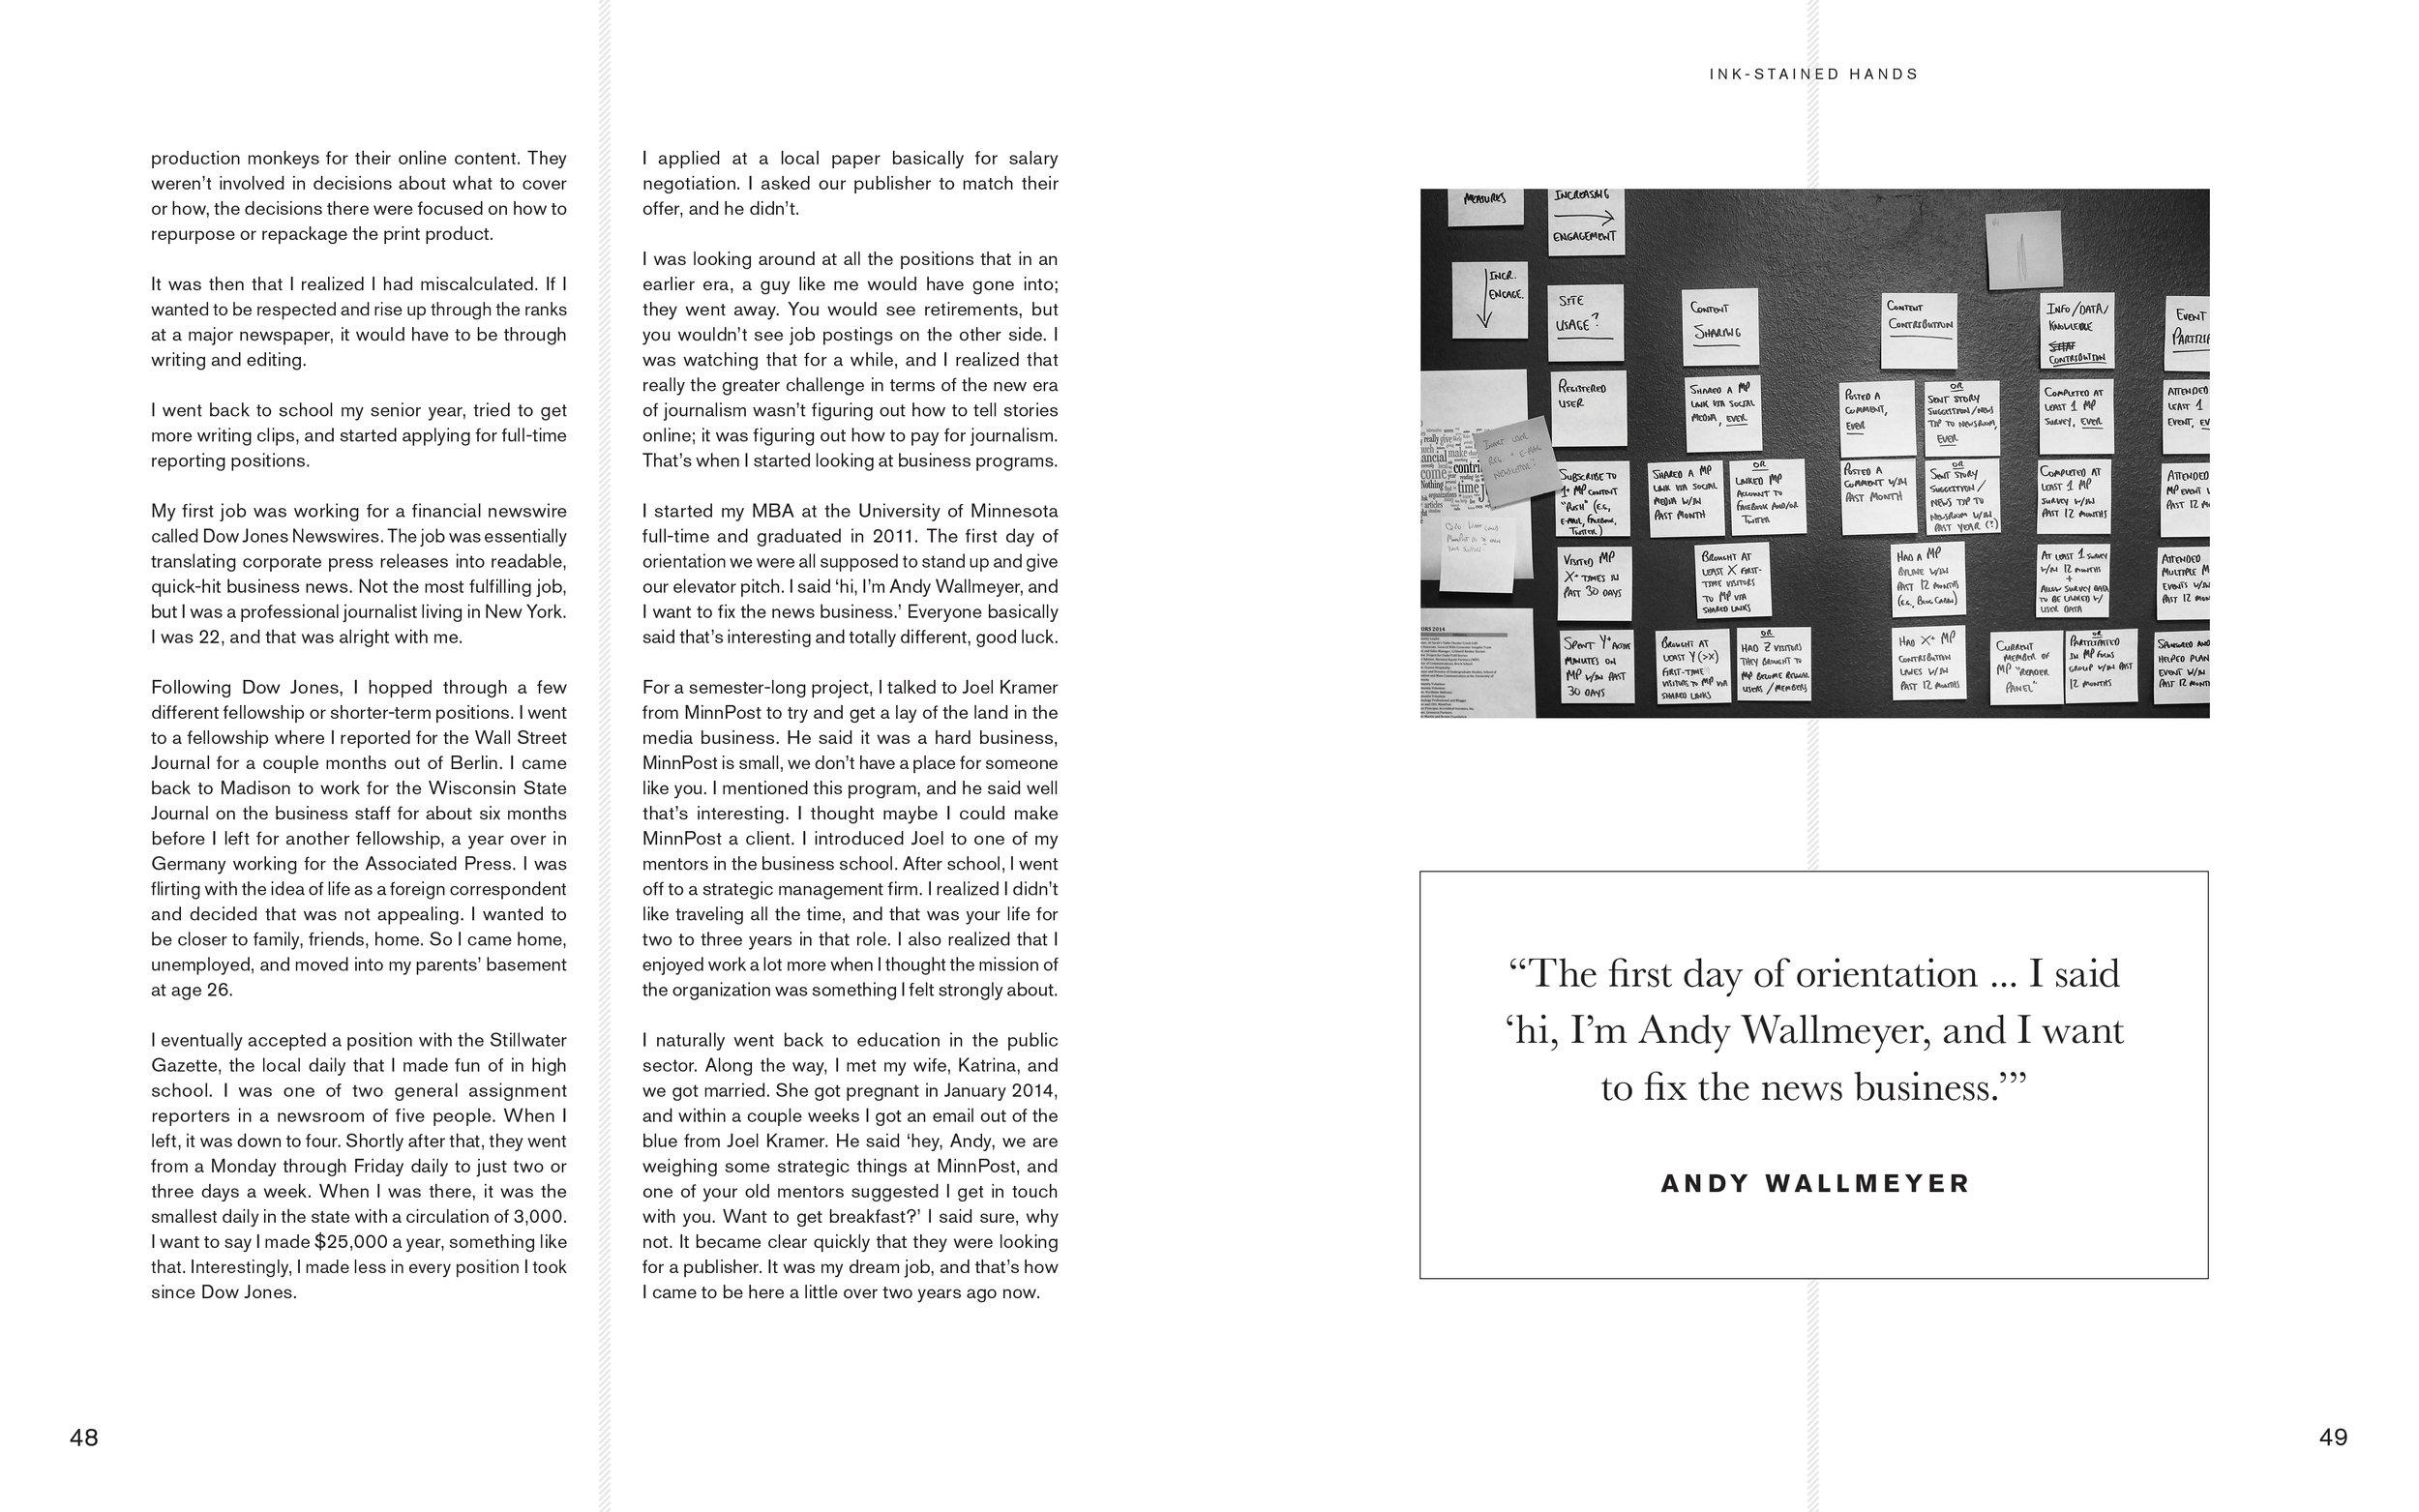 waldmeyer 48-49.jpg